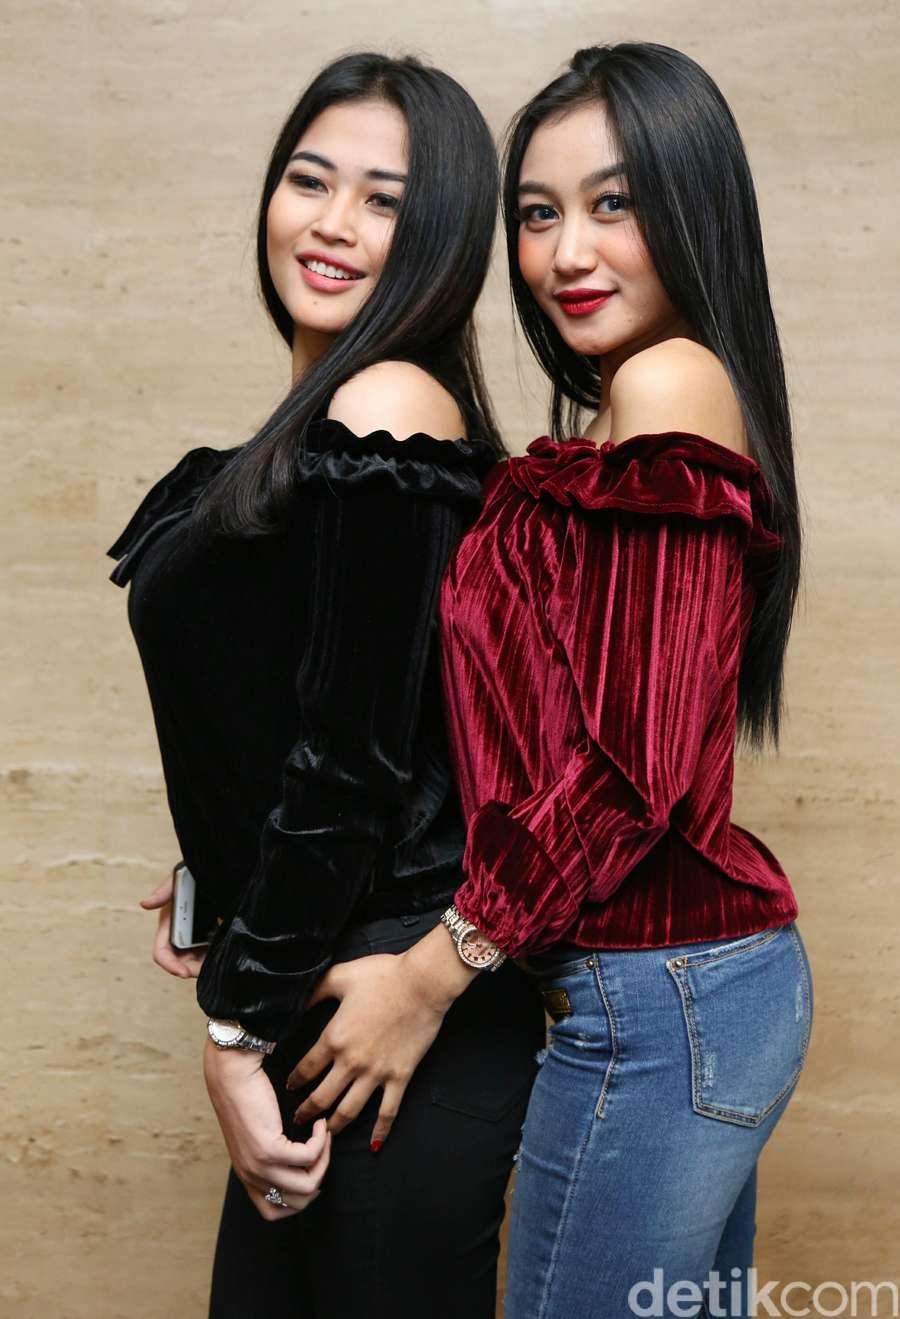 Foto hot duo serigala - Merahnya Pipi Pamela Duo Serigala Denada Kangen Ihsan Tarore